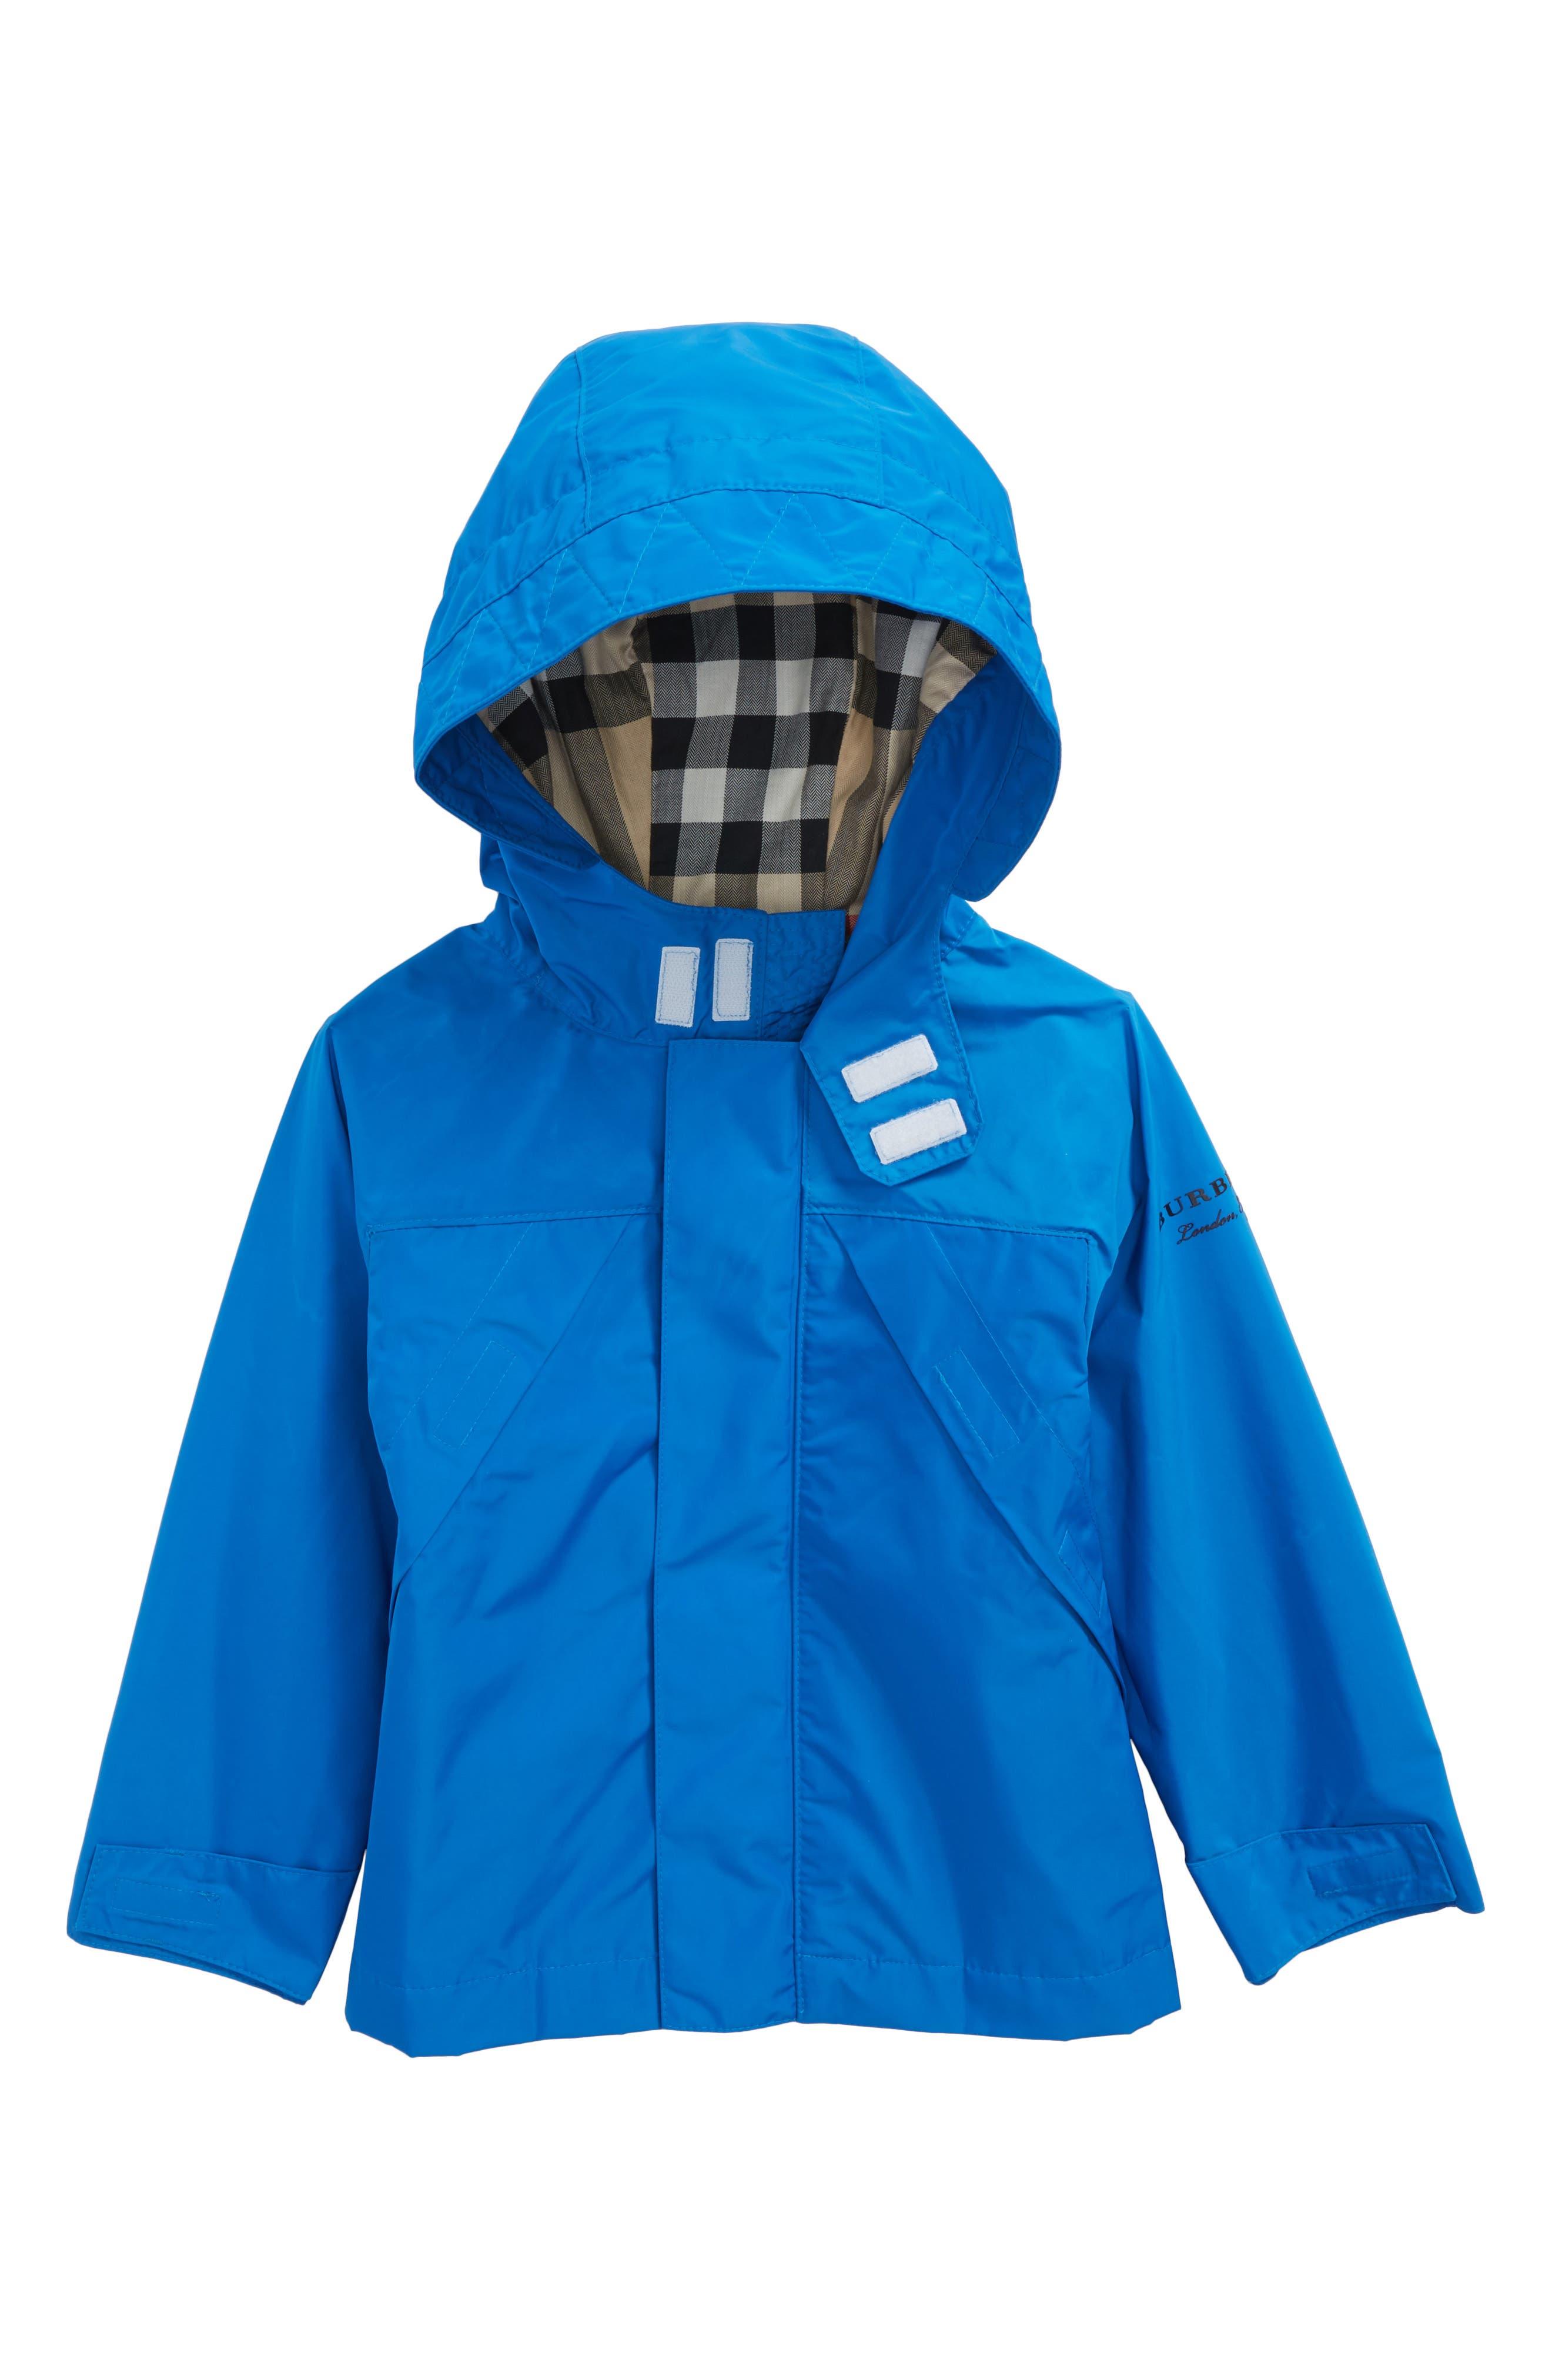 Yeoman Hooded Taffeta Windbreaker Jacket,                         Main,                         color, Azure Blue